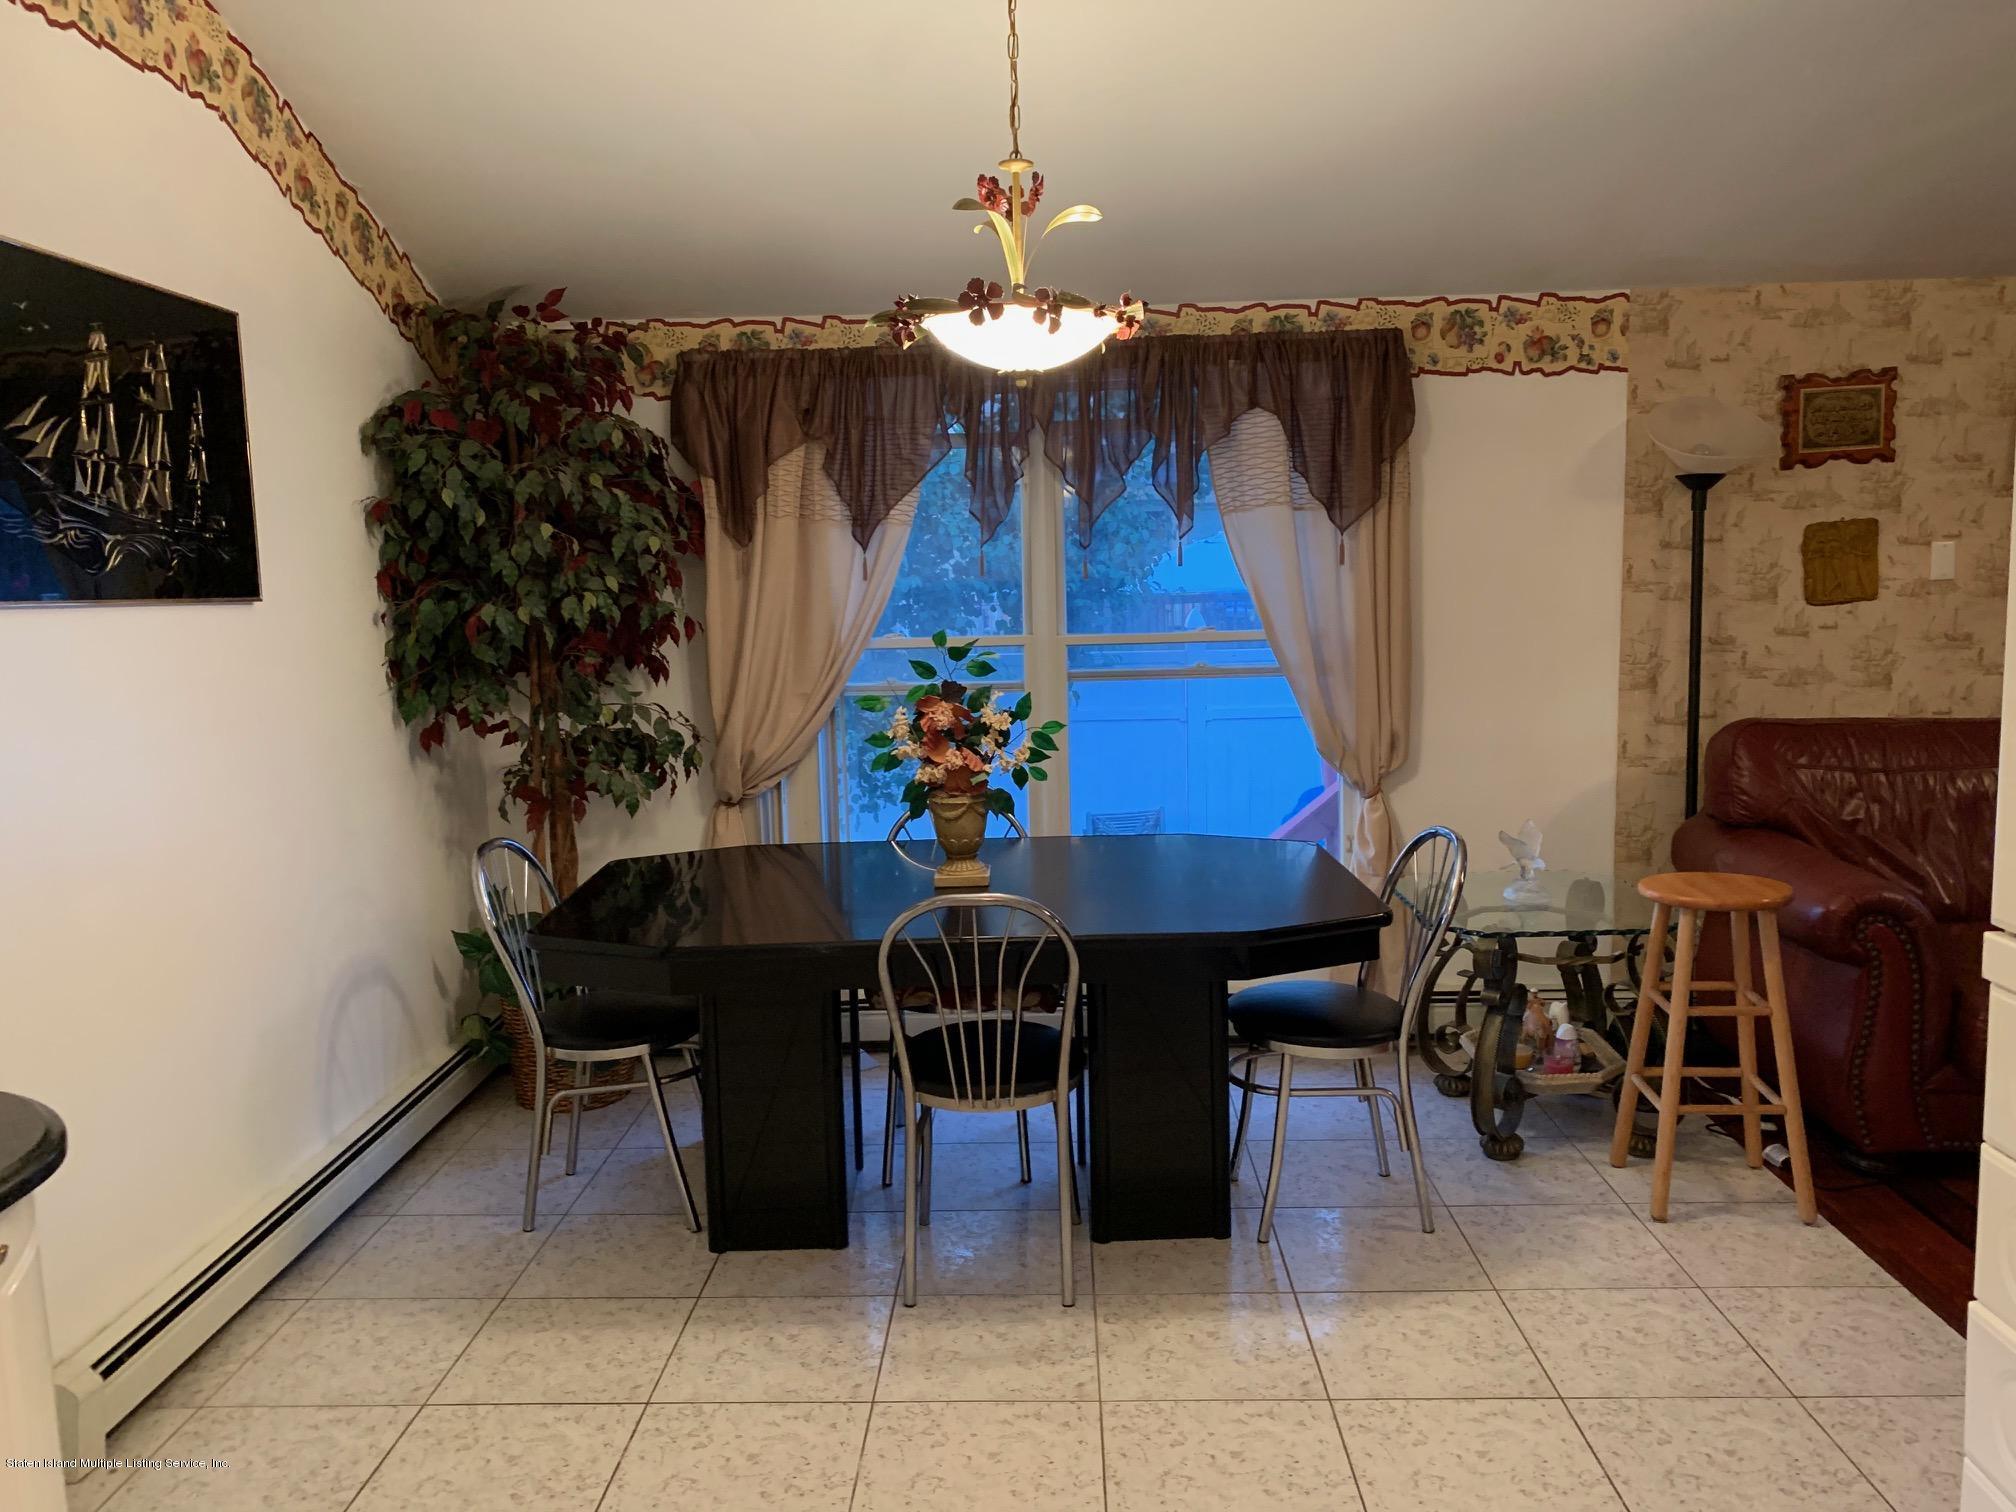 5787 Hylan Boulevard,Staten Island,New York,10309,United States,4 Bedrooms Bedrooms,7 Rooms Rooms,4 BathroomsBathrooms,Residential,Hylan,1131547